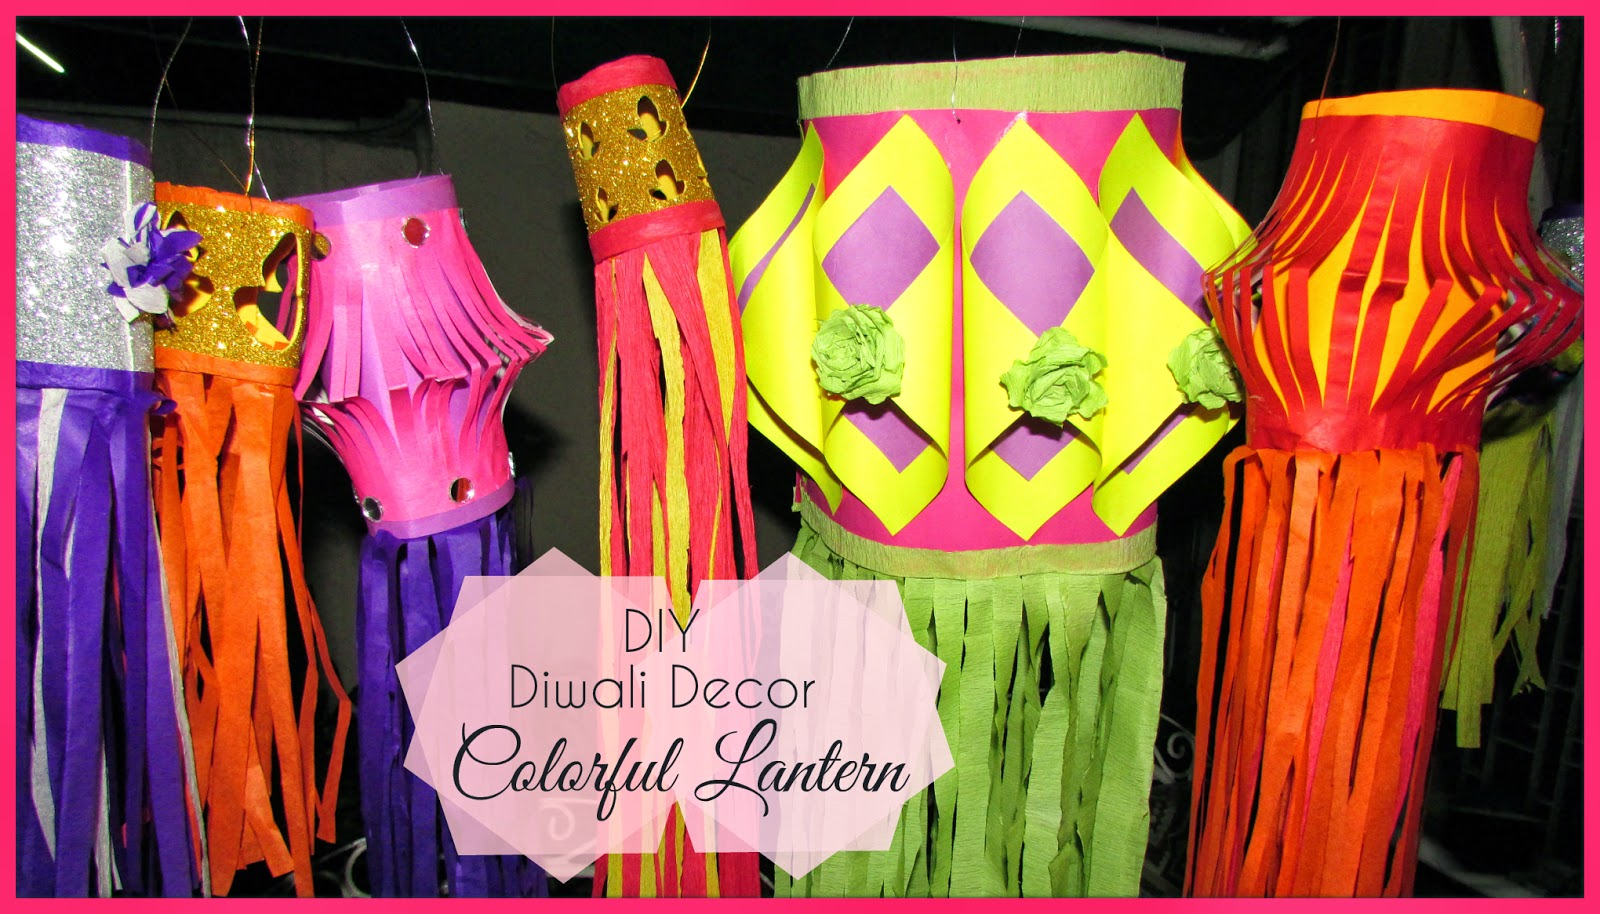 diwali, diwali decor, DIY diwali decor, kandeel, lantern, DIY lantern, DIY kandeel, colorful diwali decor, how to decorate hose for diwali, how to make lanterns, how to make lanterns at home